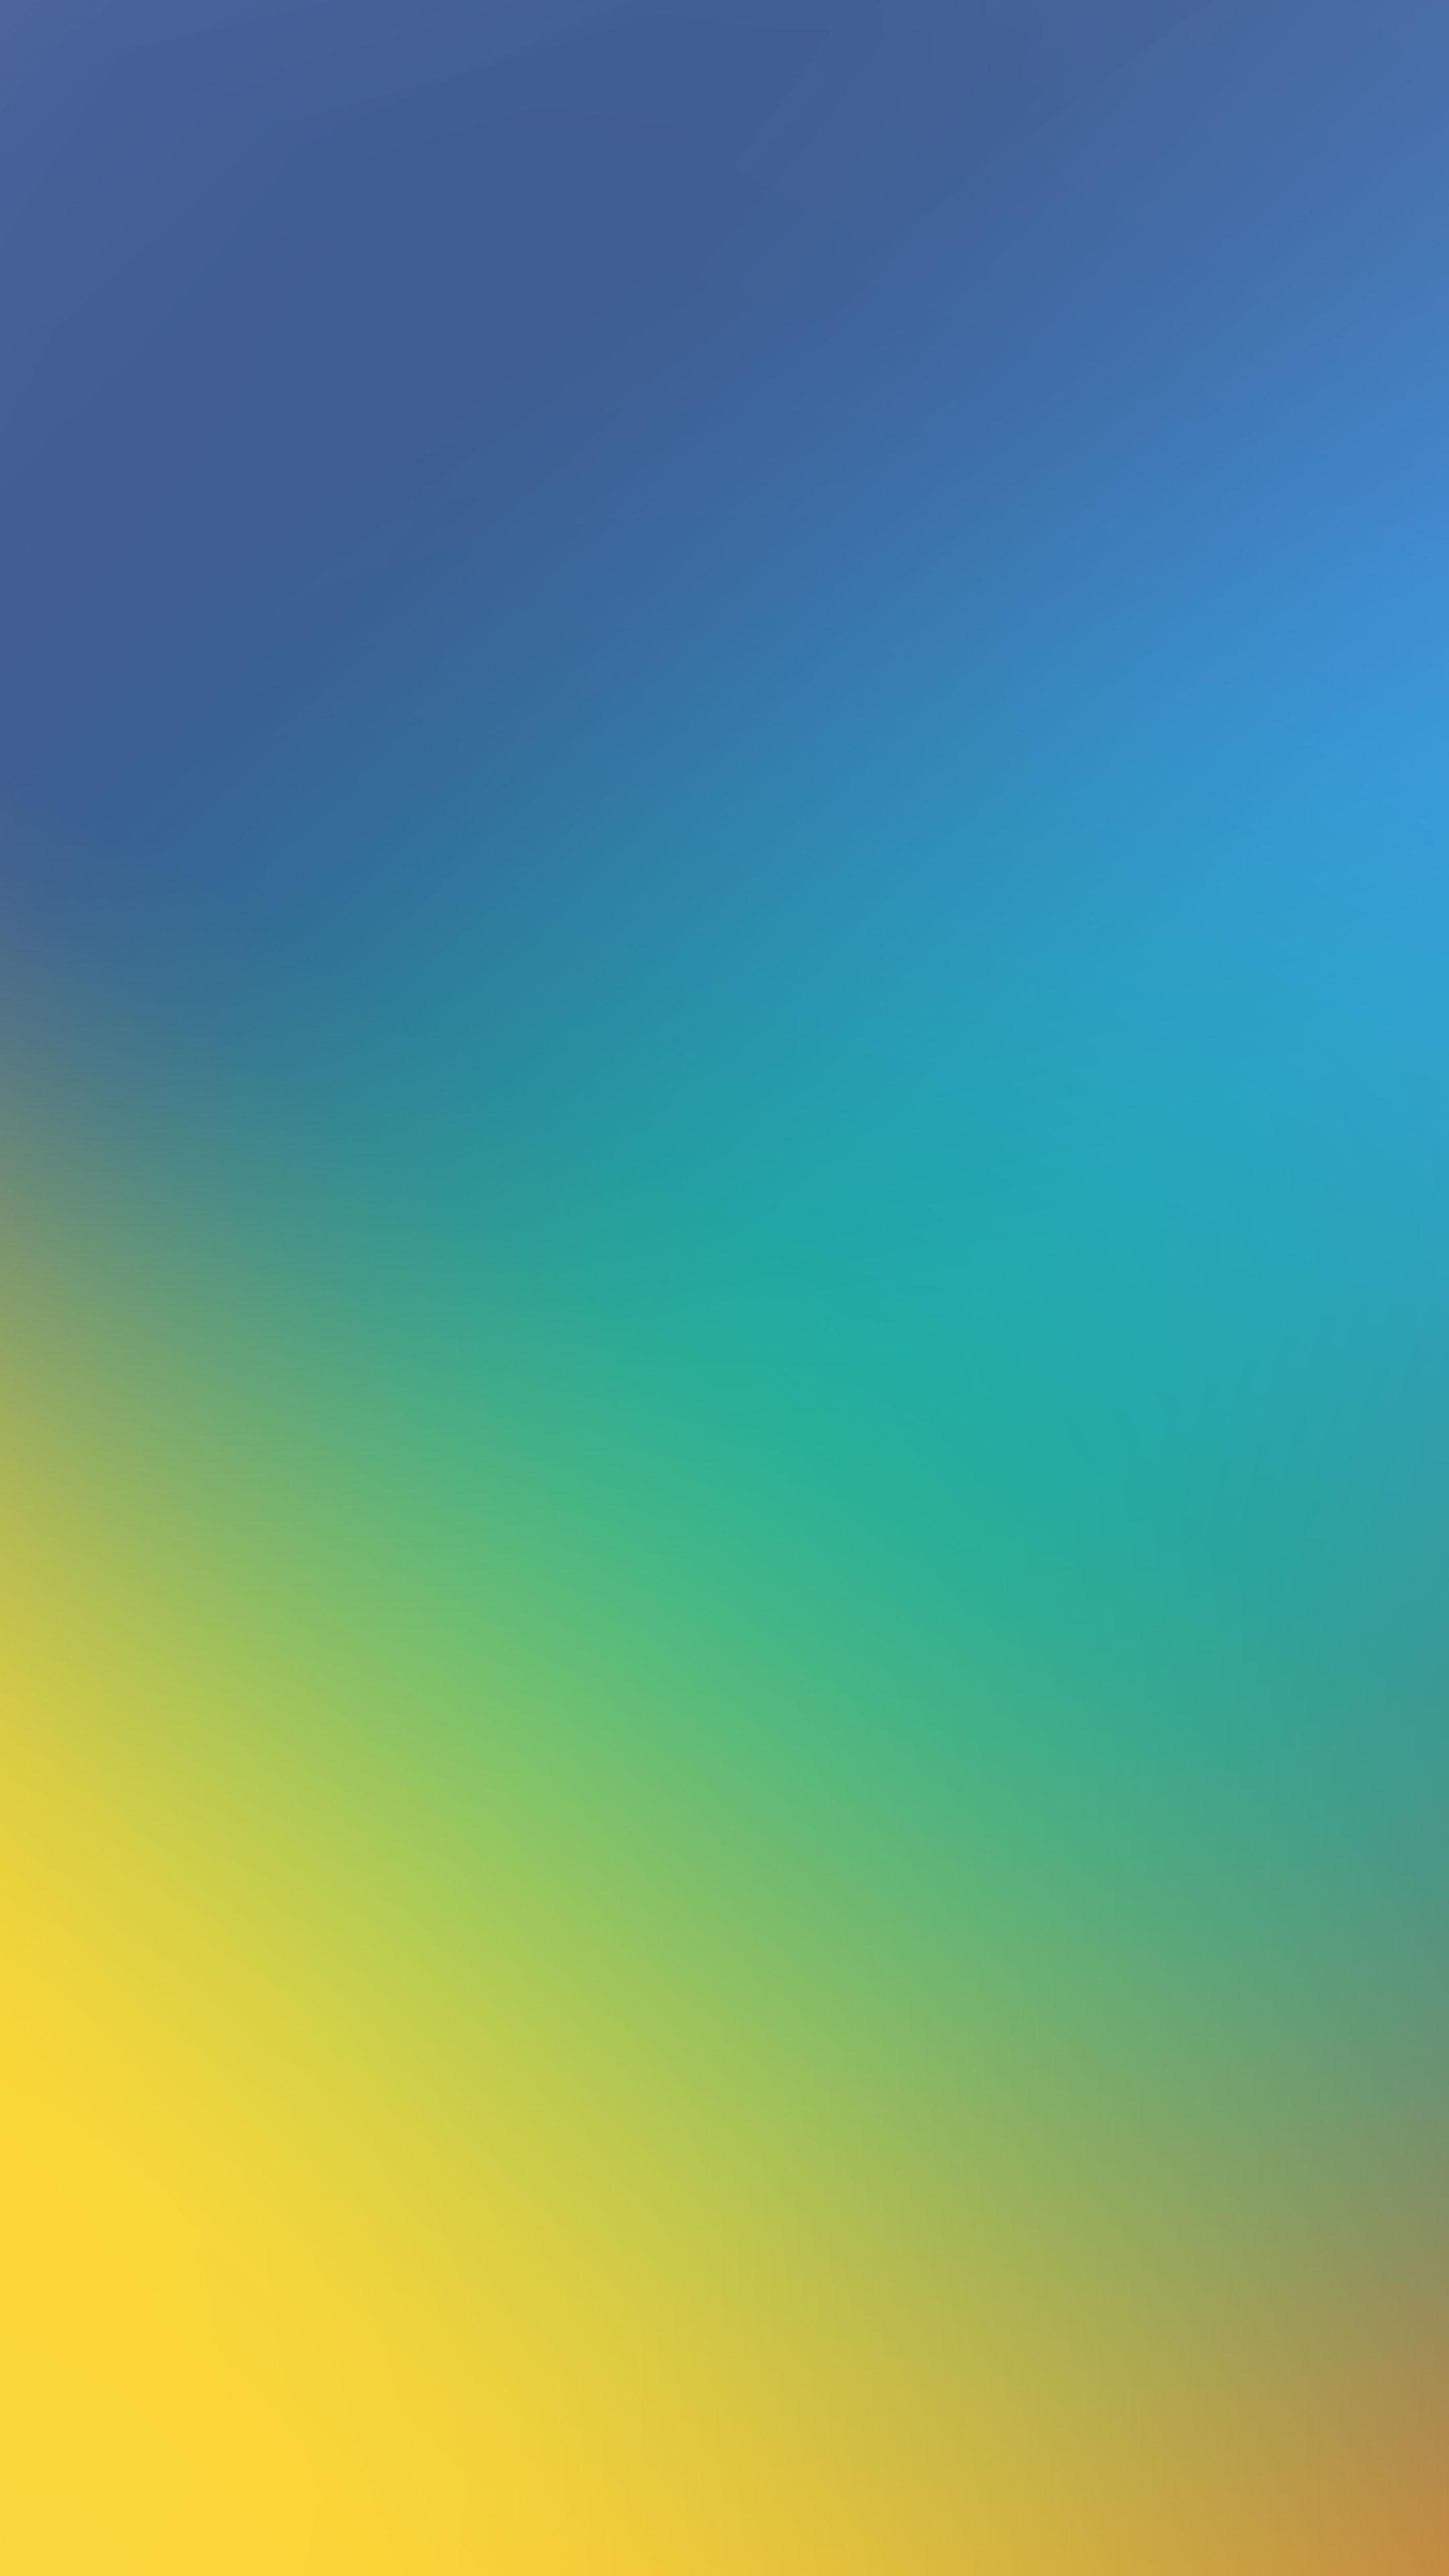 Wallpaper Gradient, Blue Yellow, Abstract, 4k   Data - Iphone Color Wallpaper 4k - HD Wallpaper